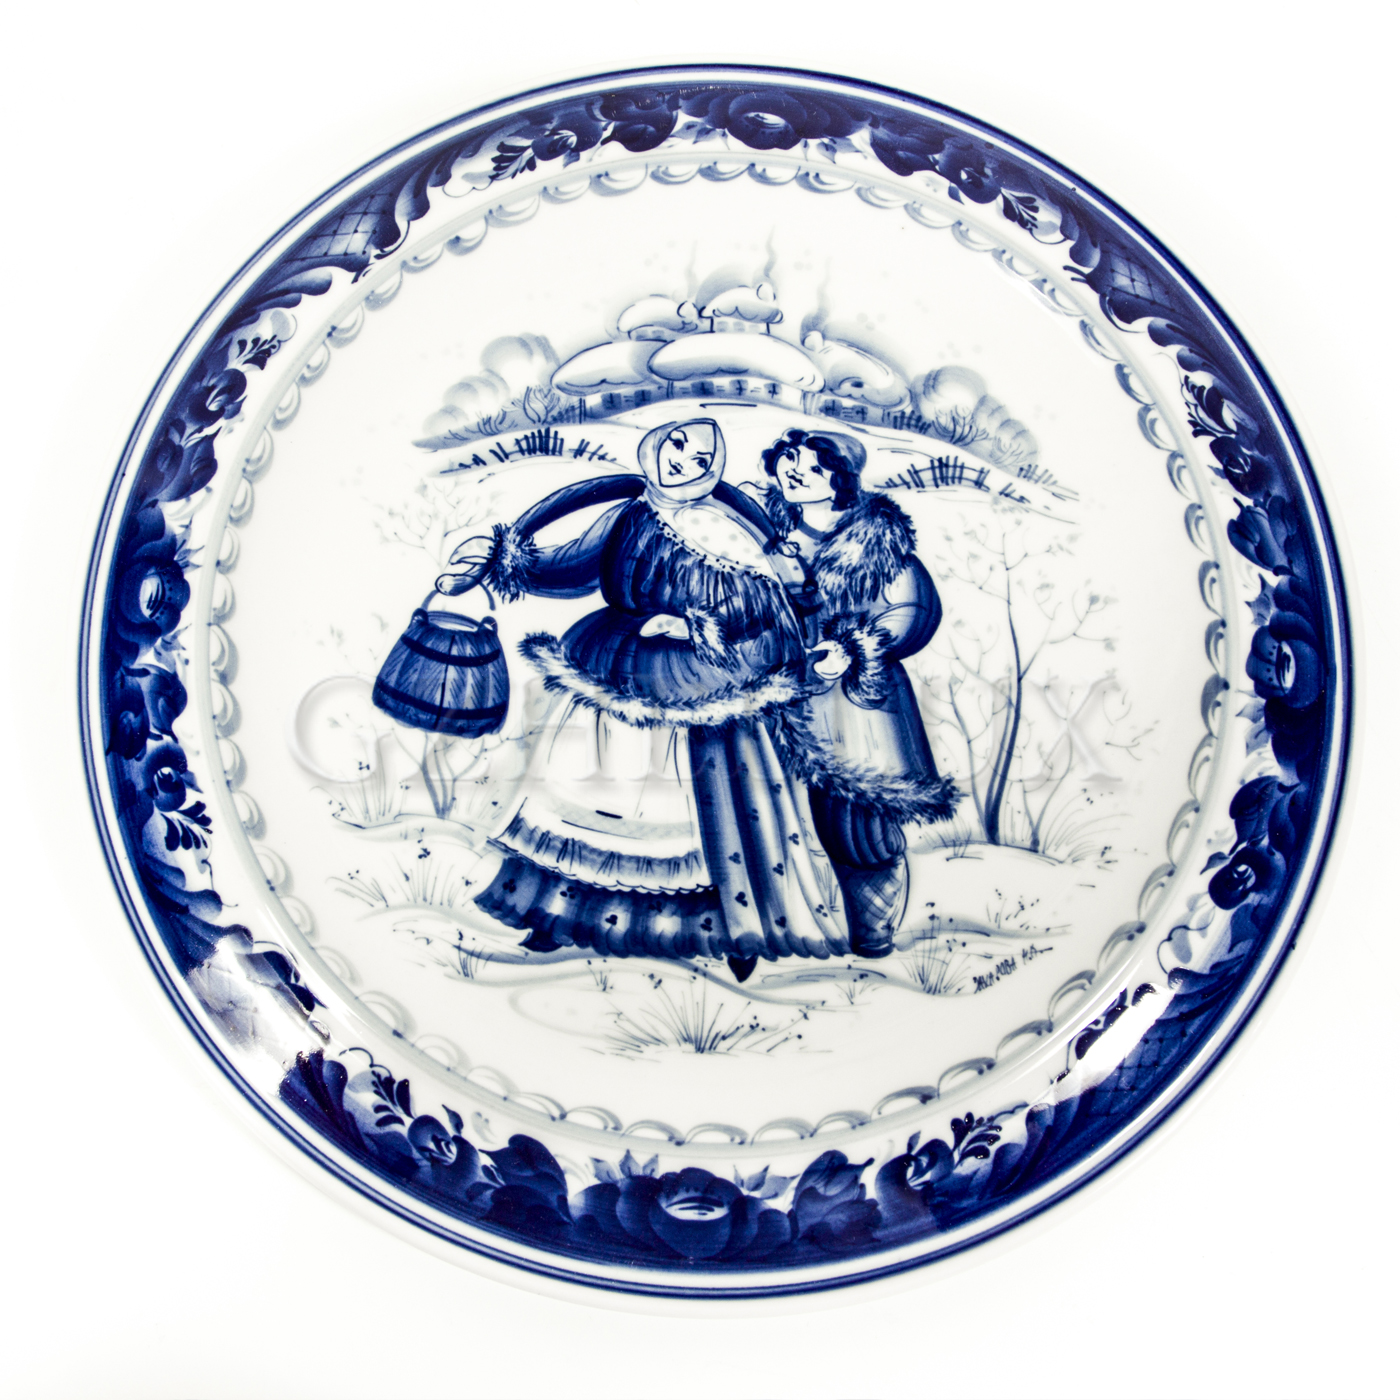 Тарелка декоративная «По воду»